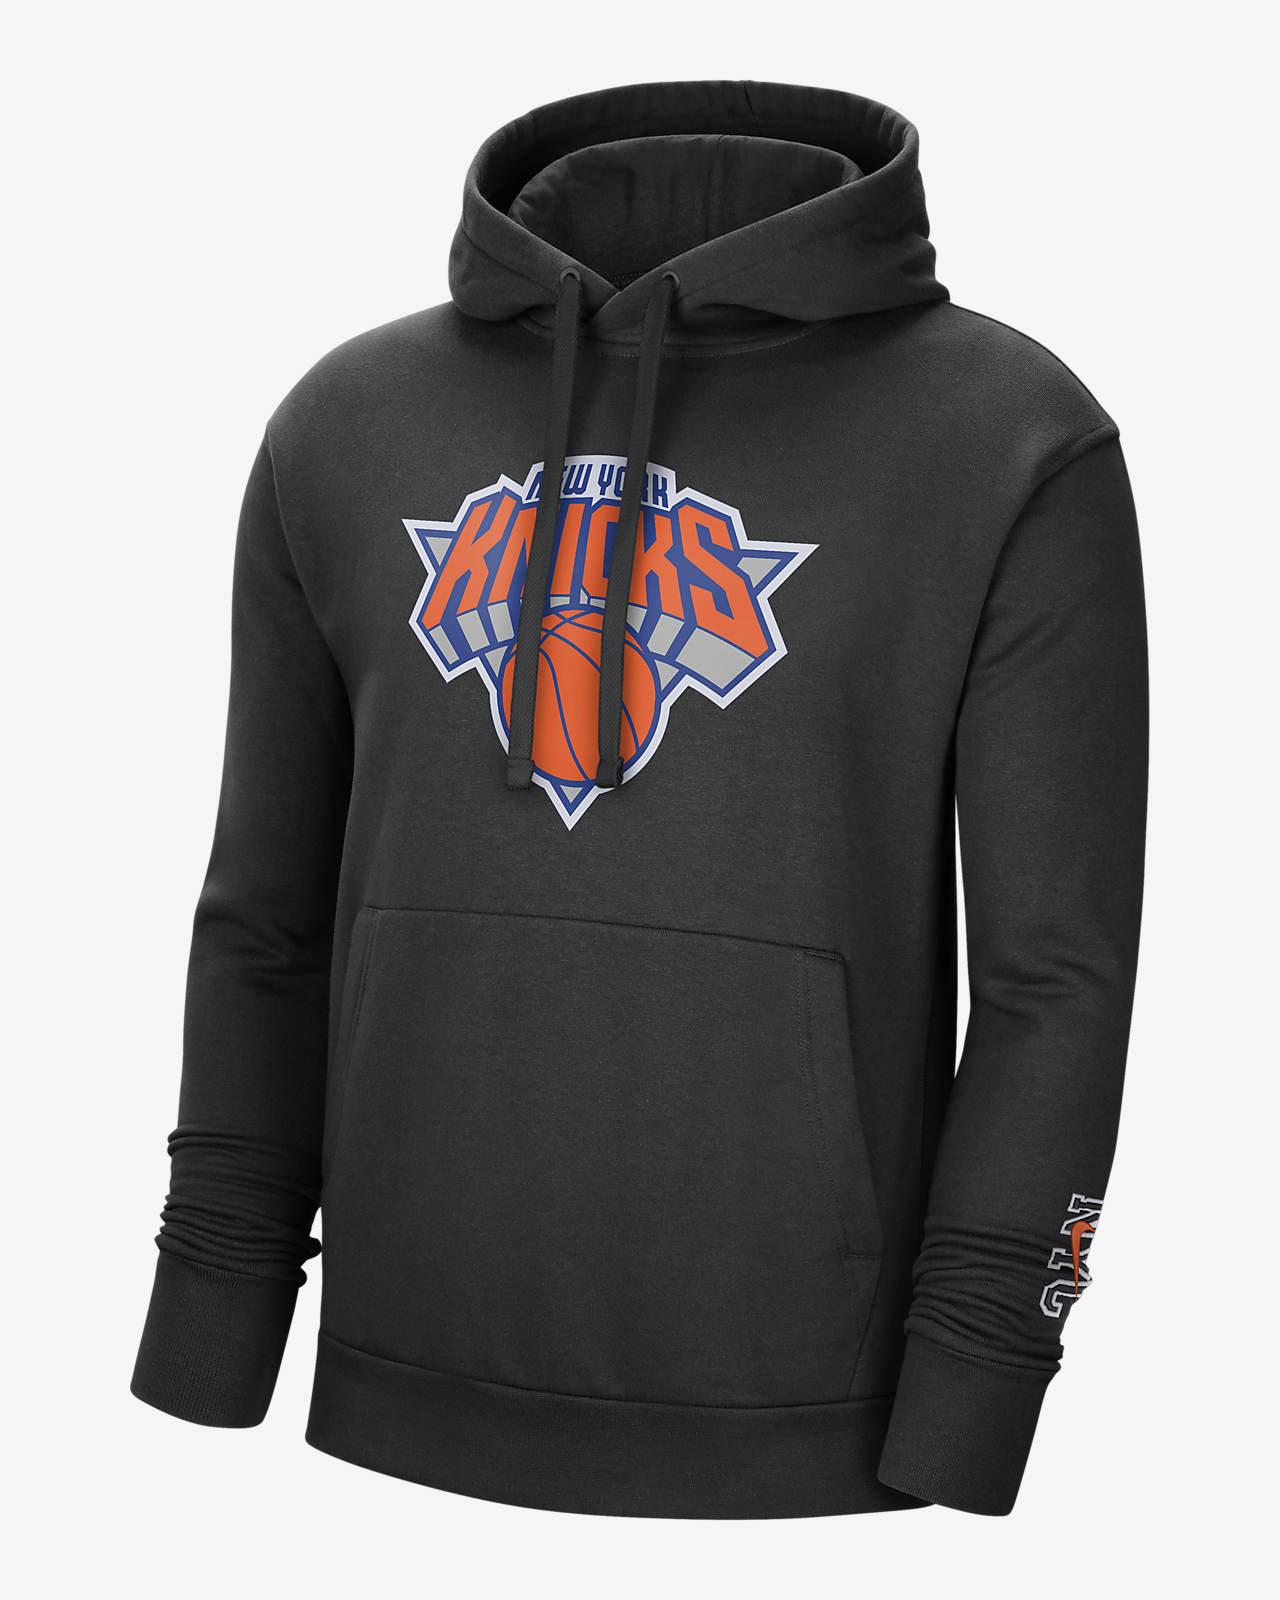 Felpa pullover con cappuccio New York Knicks City Edition Logo Nike NBA - Uomo